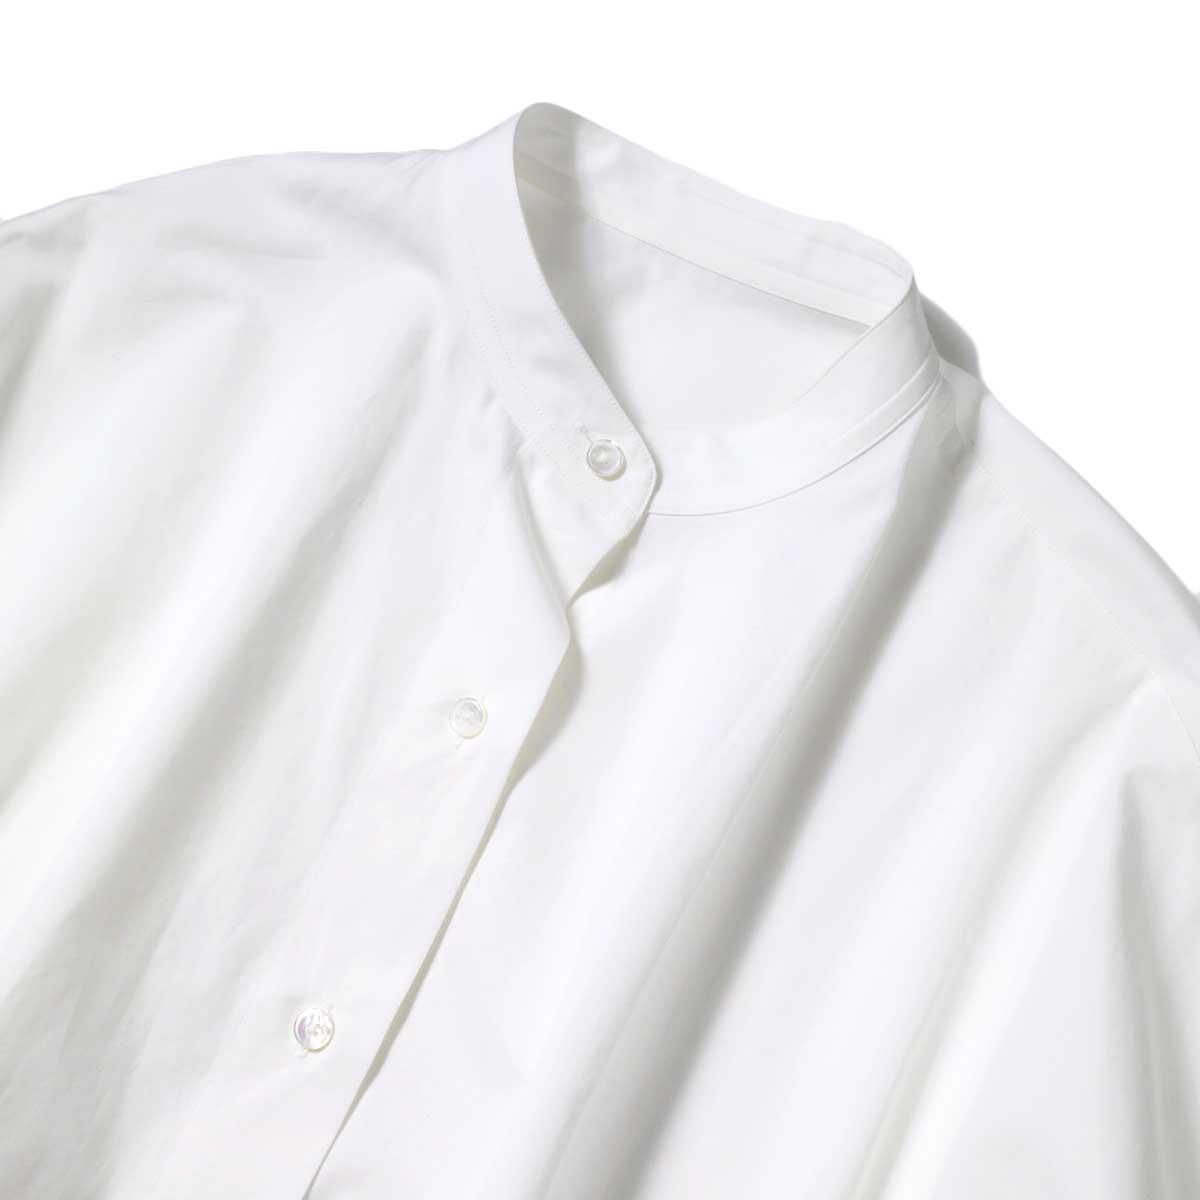 YLEVE / COTTON TYPEW RITER BIG SHIRT (White) 襟